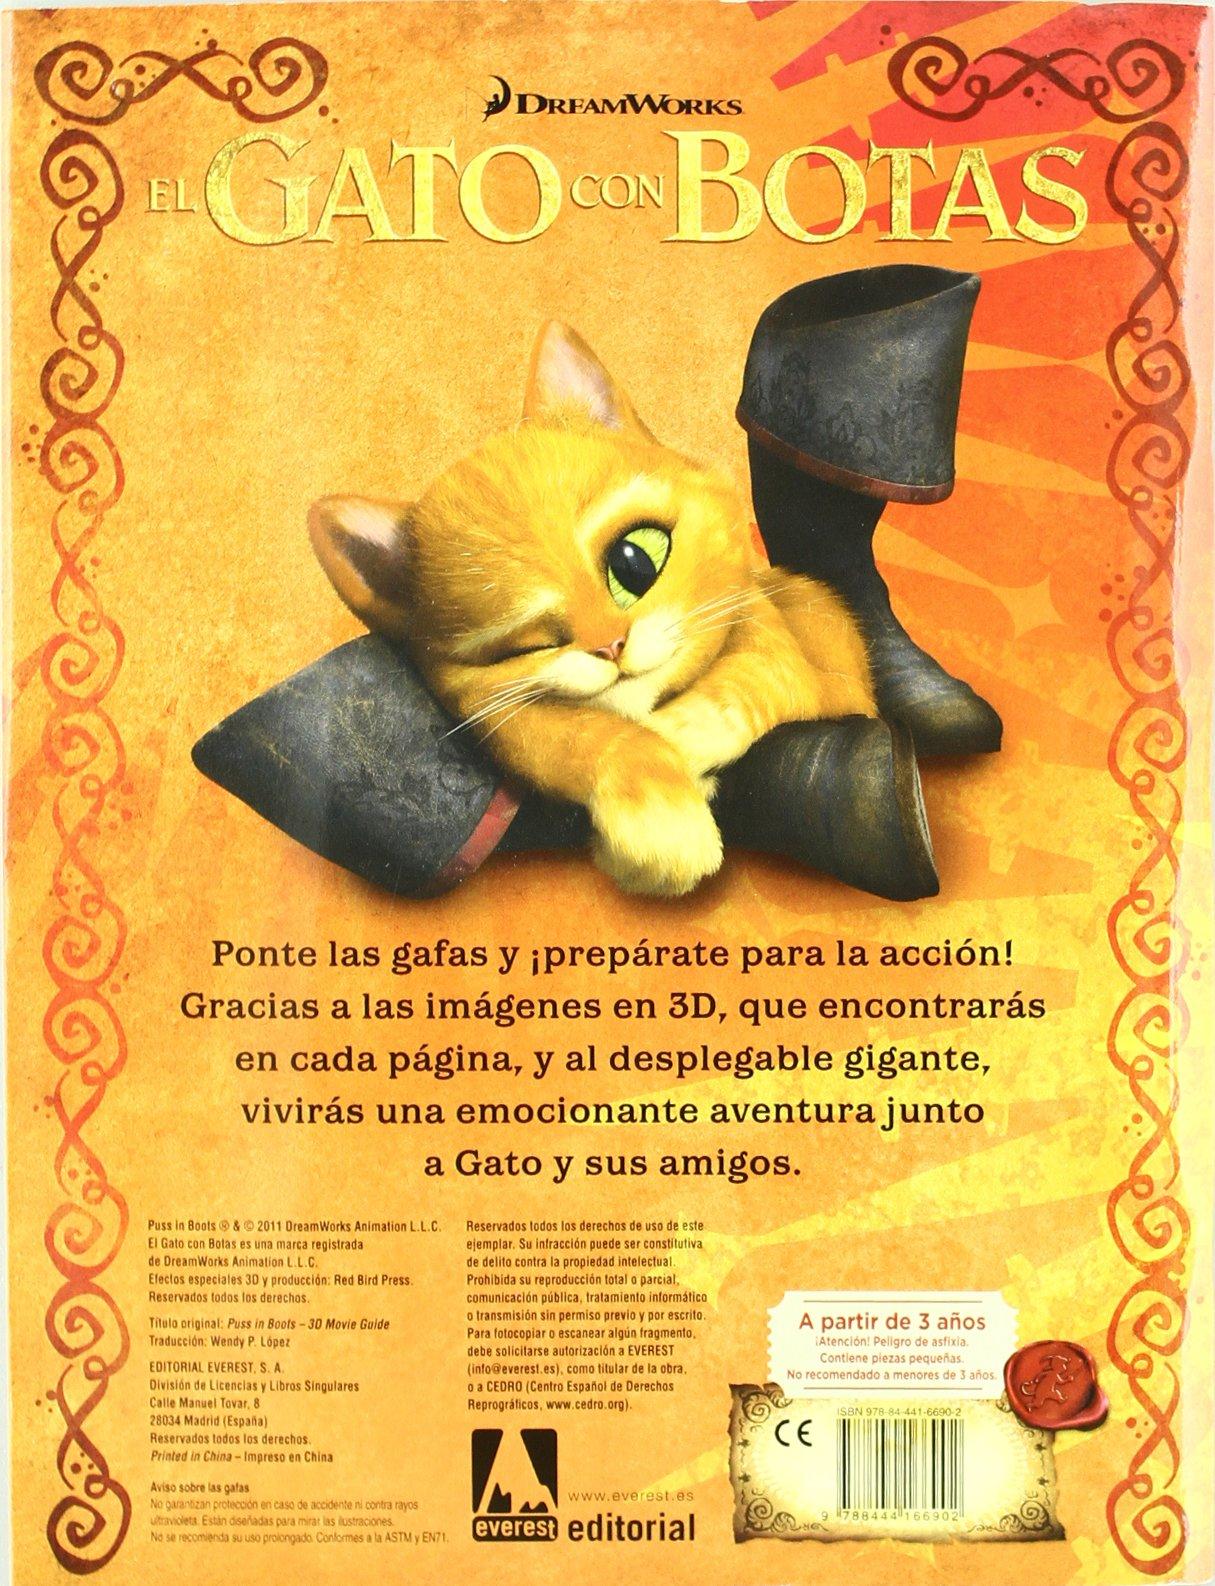 El gato con botas. Guia de la película: Amanda; DreamWorks Díaz Cobo: 9788444166902: Amazon.com: Books